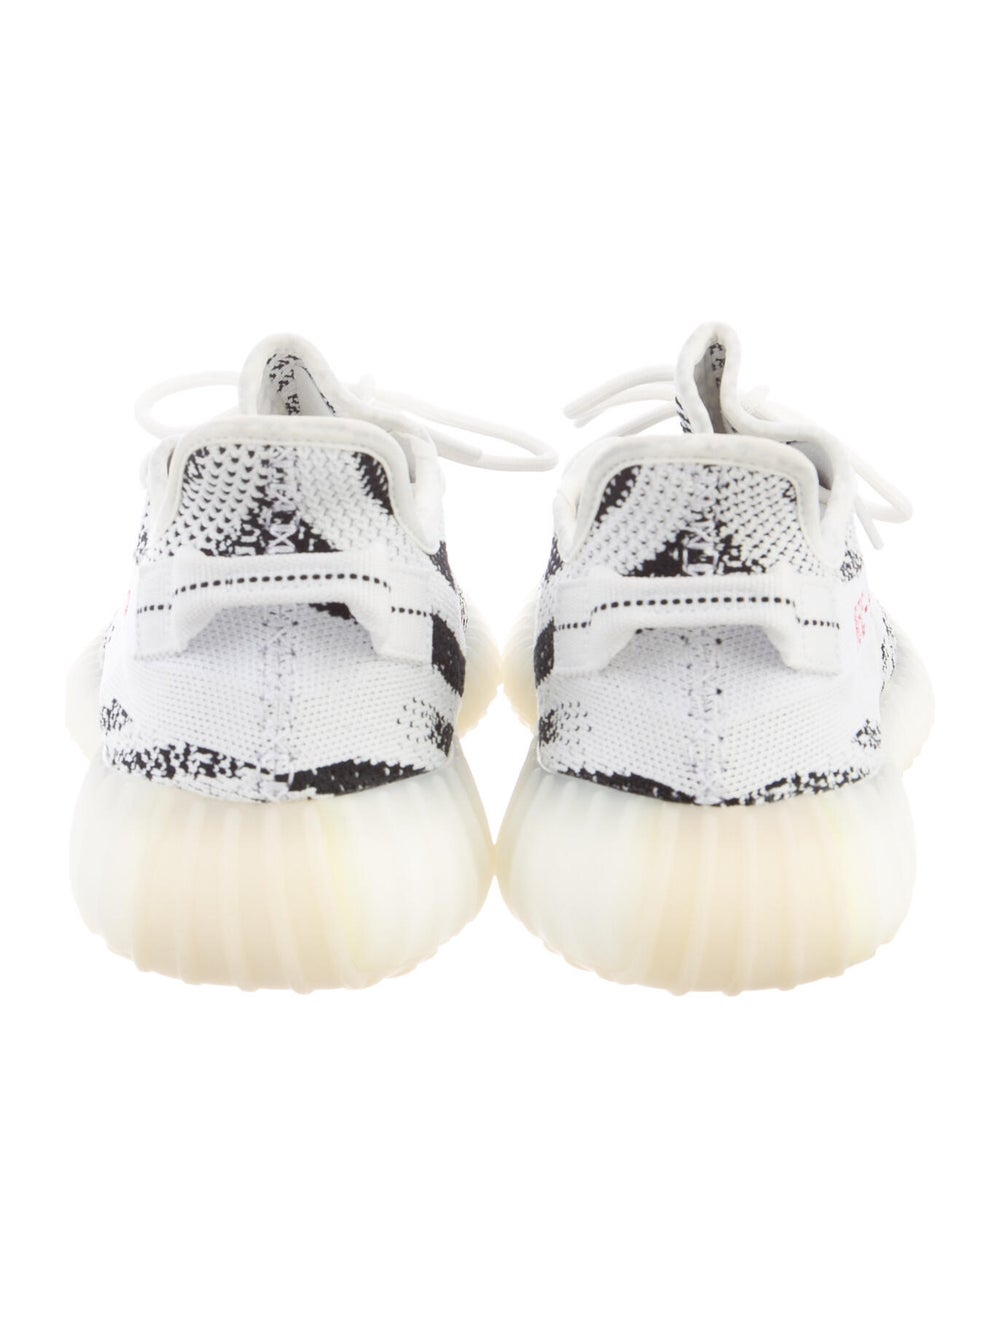 Yeezy Yeezy Boost 350 V2 Zebra Sneakers Black - image 4